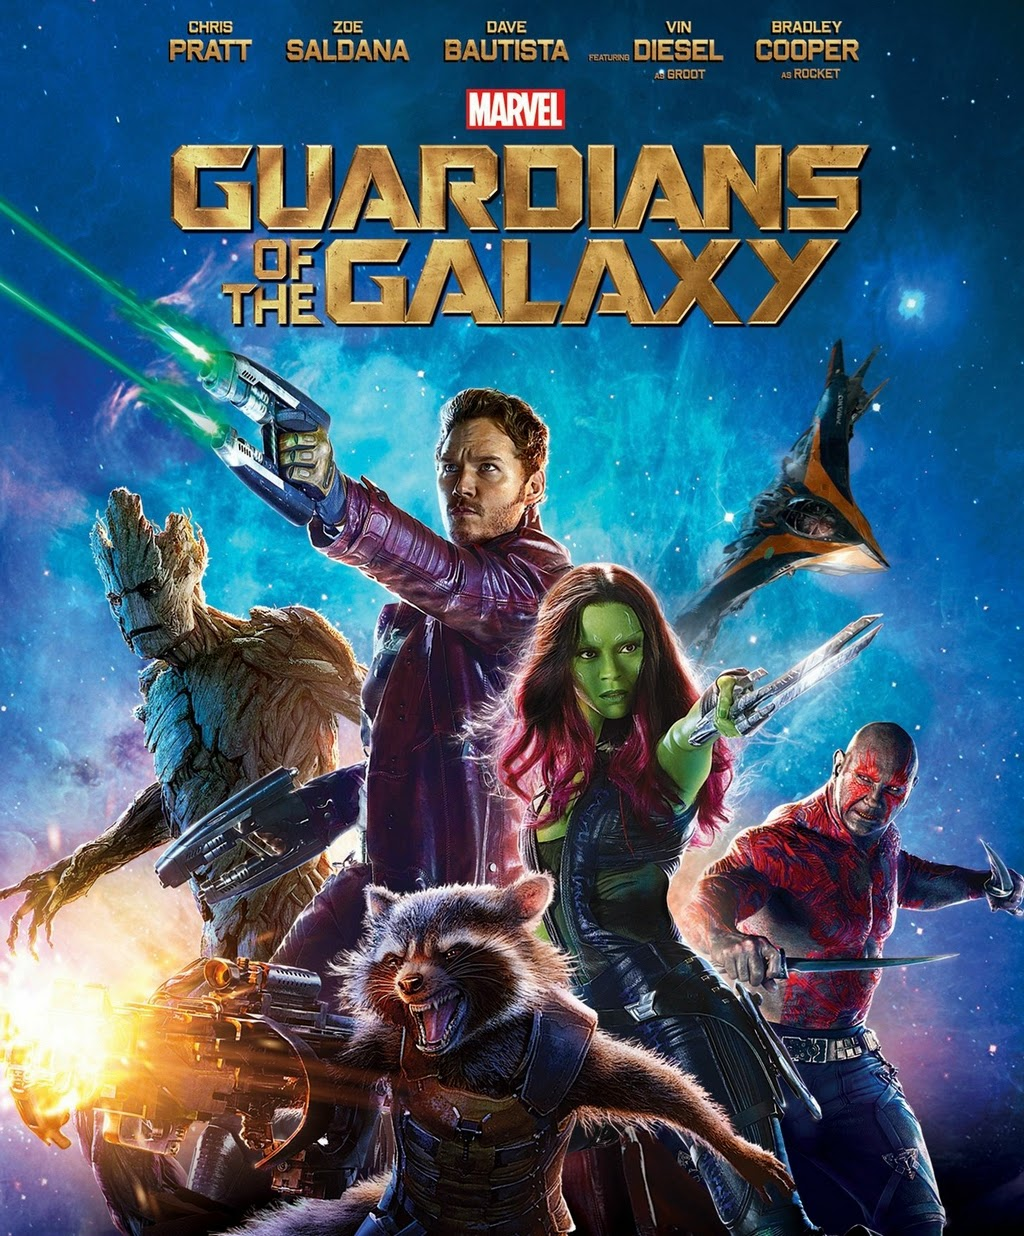 Guardians of the Galaxy รวมพันธุ์นักสู้พิทักษ์จักรวาล HD 2014 FullHD1080p